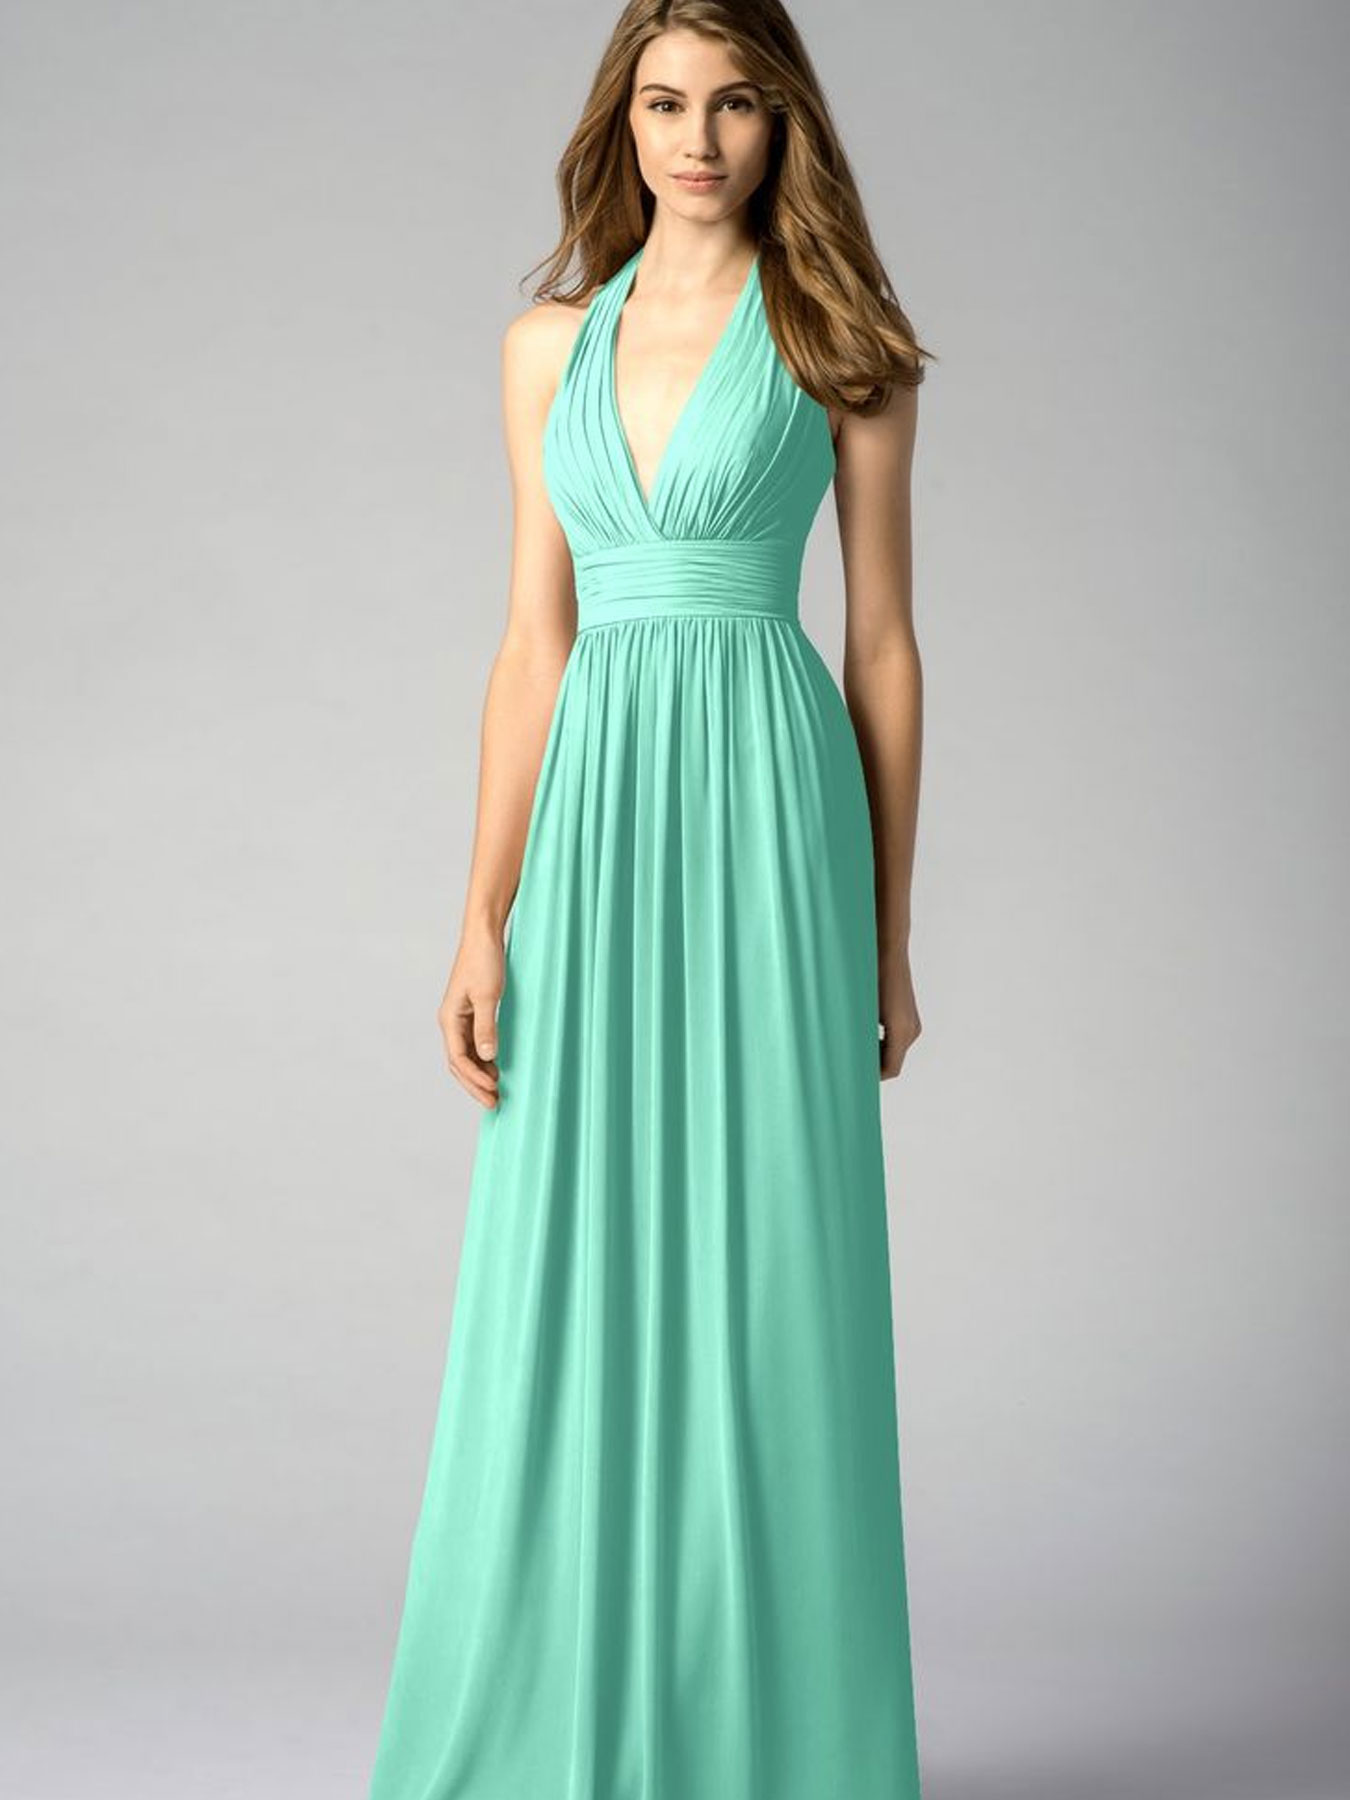 Top 20 Bridesmaid Bouquet & Dress Color Combinations of 2015 ...